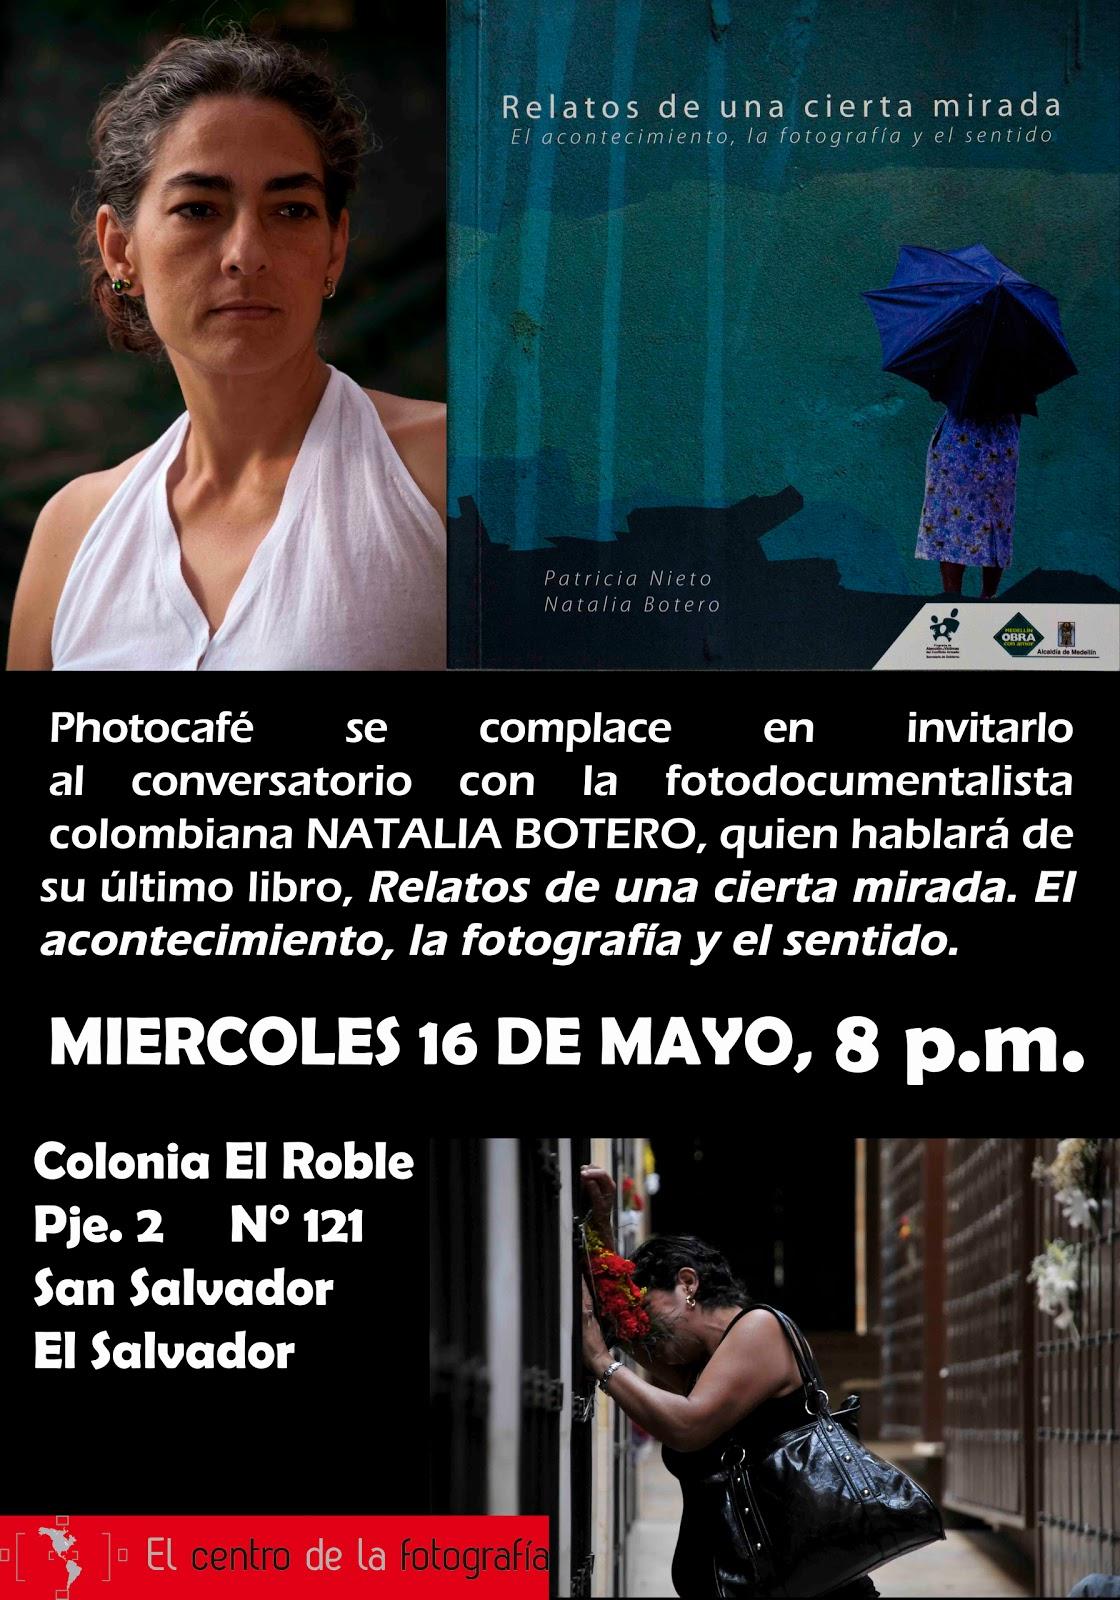 Hora mayo 16  2012 a las 8pm  Natalia Botero